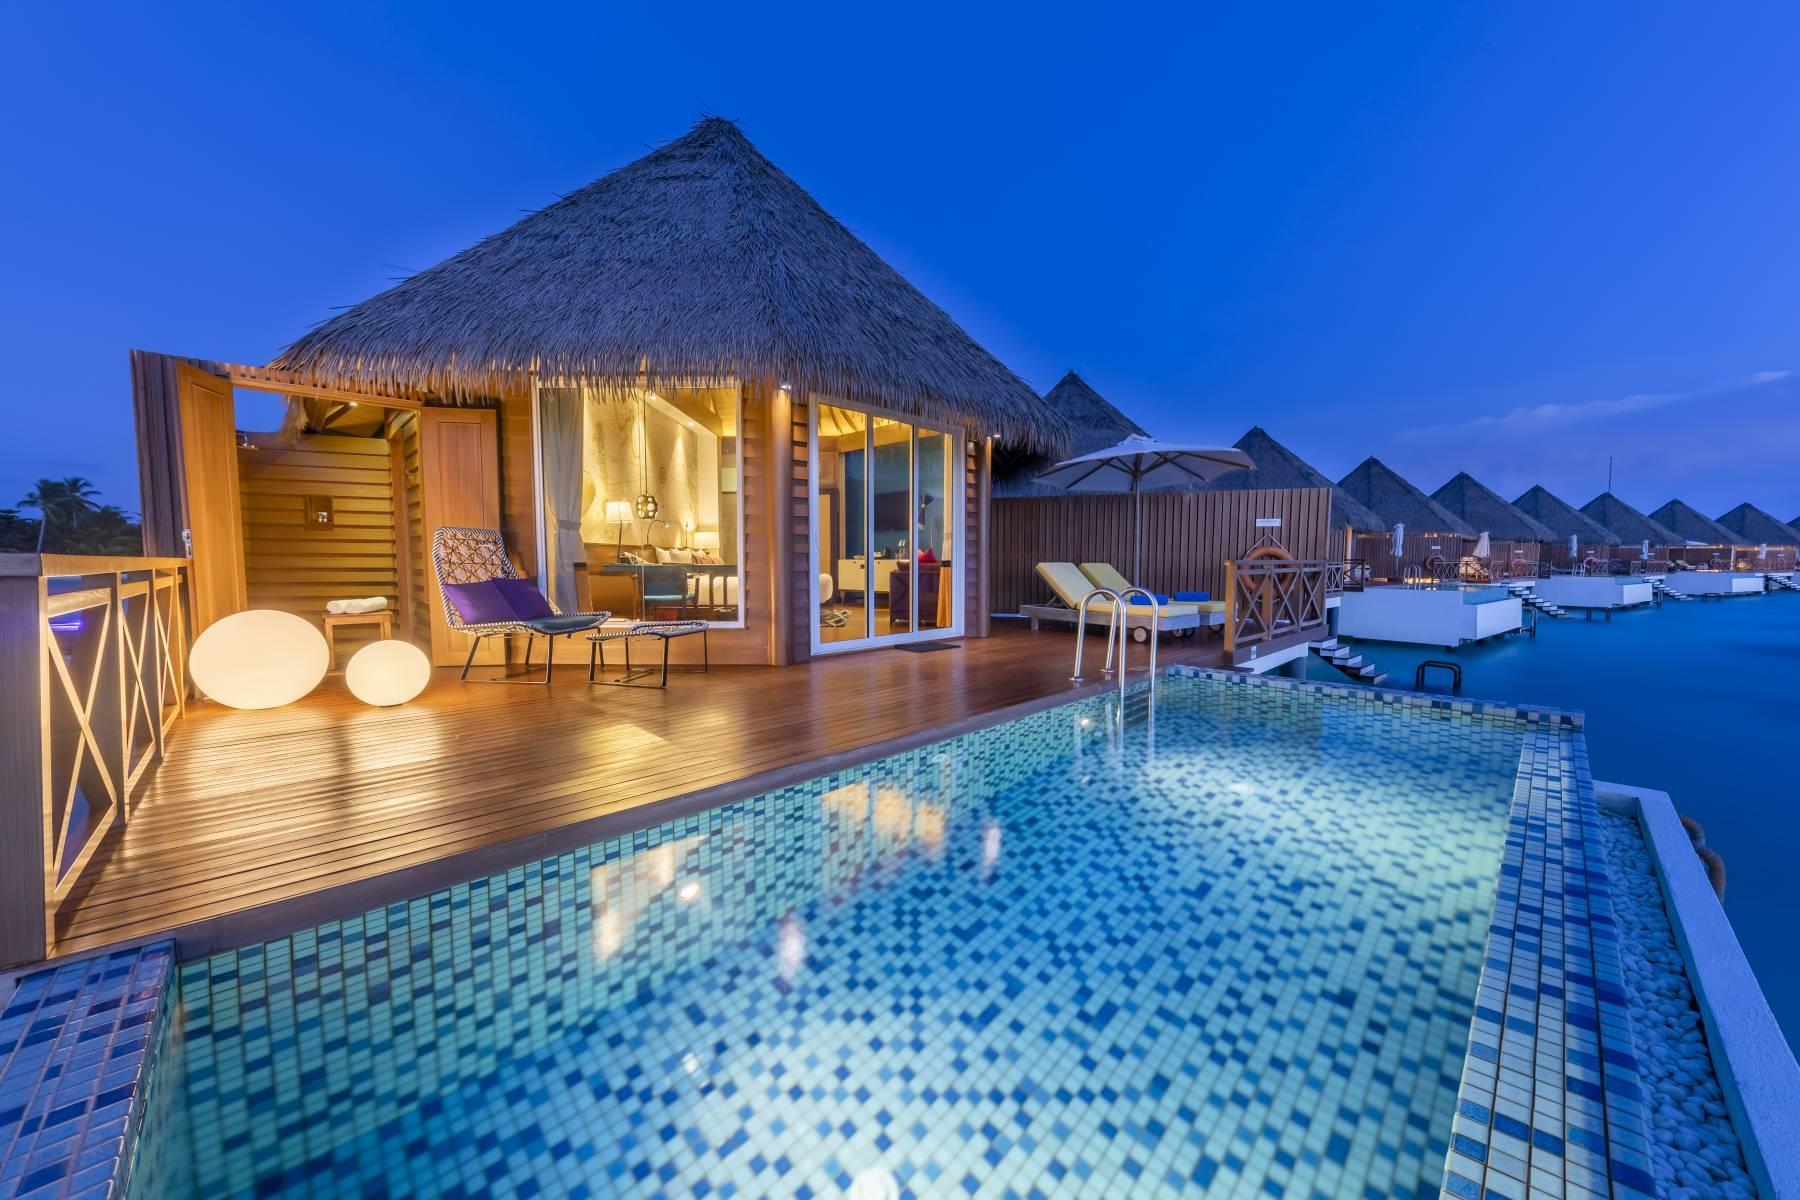 mercure-maldives-kooddoo-resort-genel-005